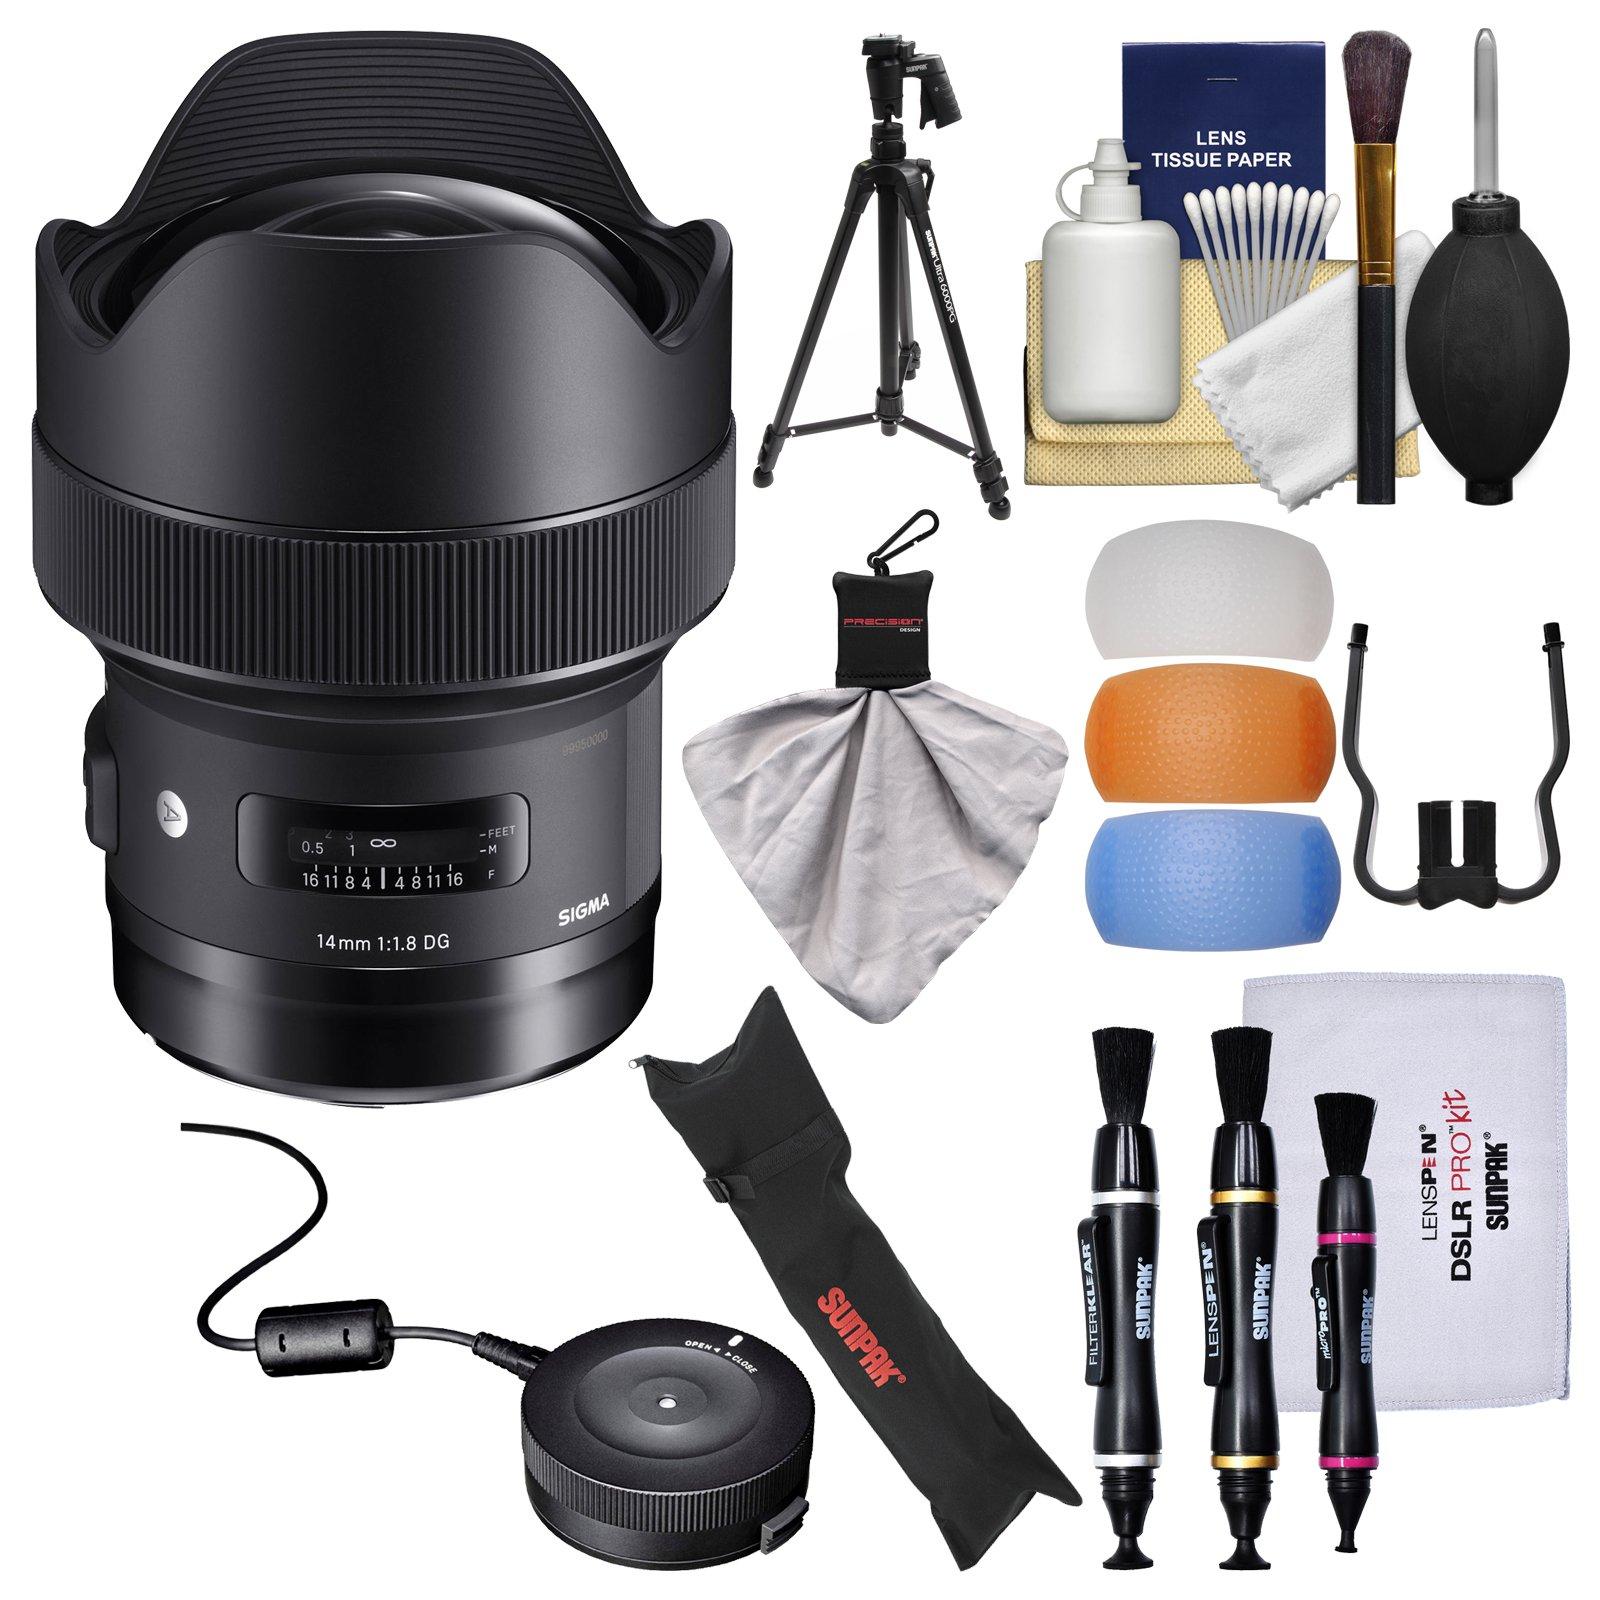 Sigma 14mm f/1.8 ART DG HSM Lens with USB Dock + Pistol Grip Tripod & Case + Kit for Nikon Digital SLR Cameras